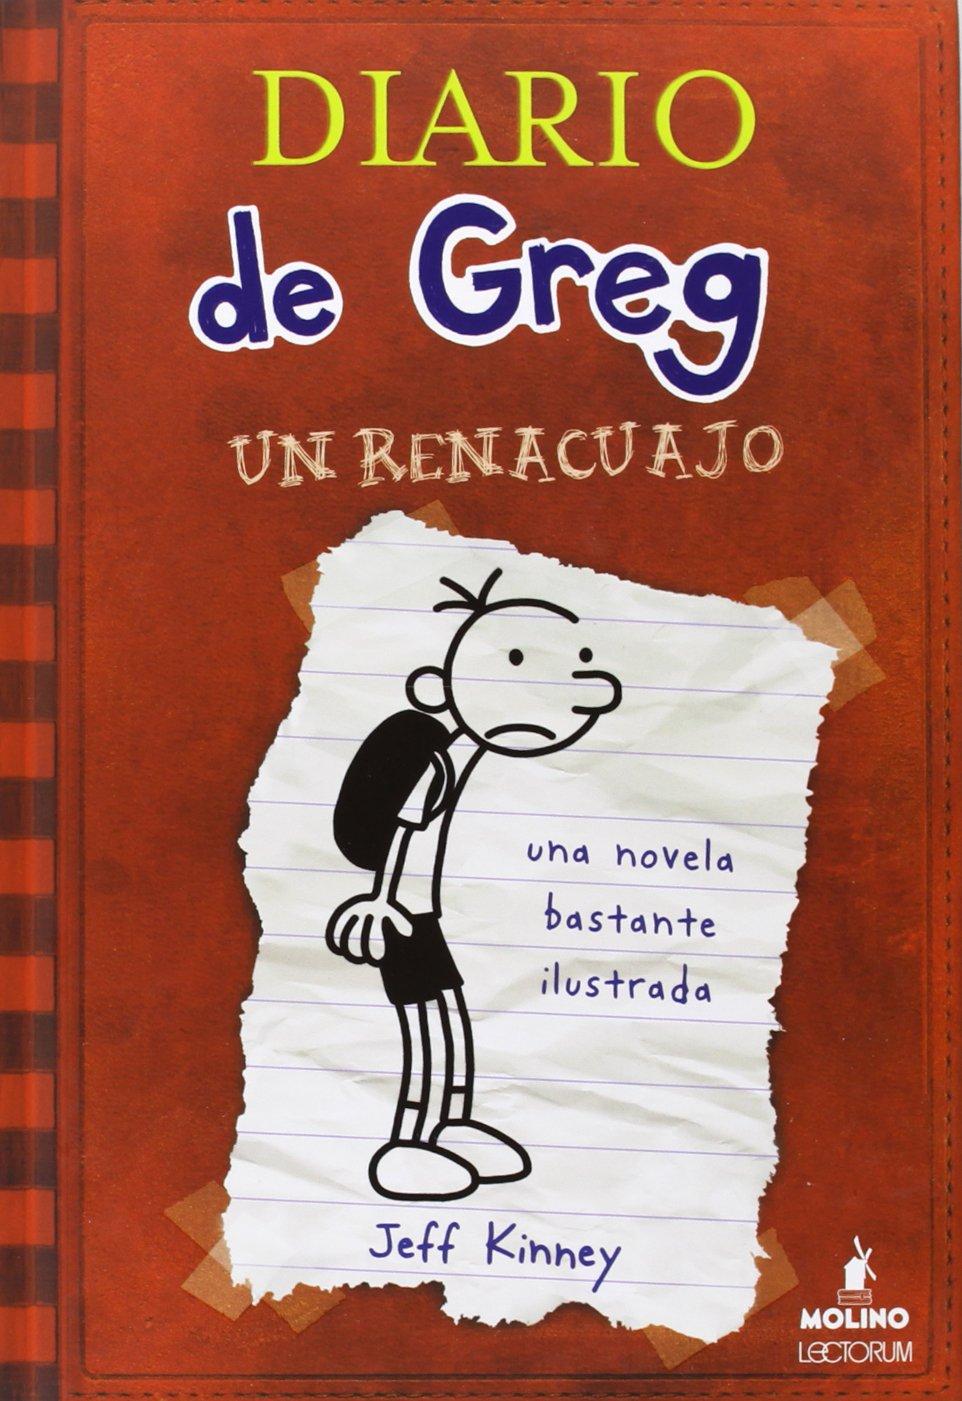 Diario De Greg Spanish Edition Jeff Kinney Lectorum Publications Pin Cartoon Pictures On Pinterest 9781933032528 Books